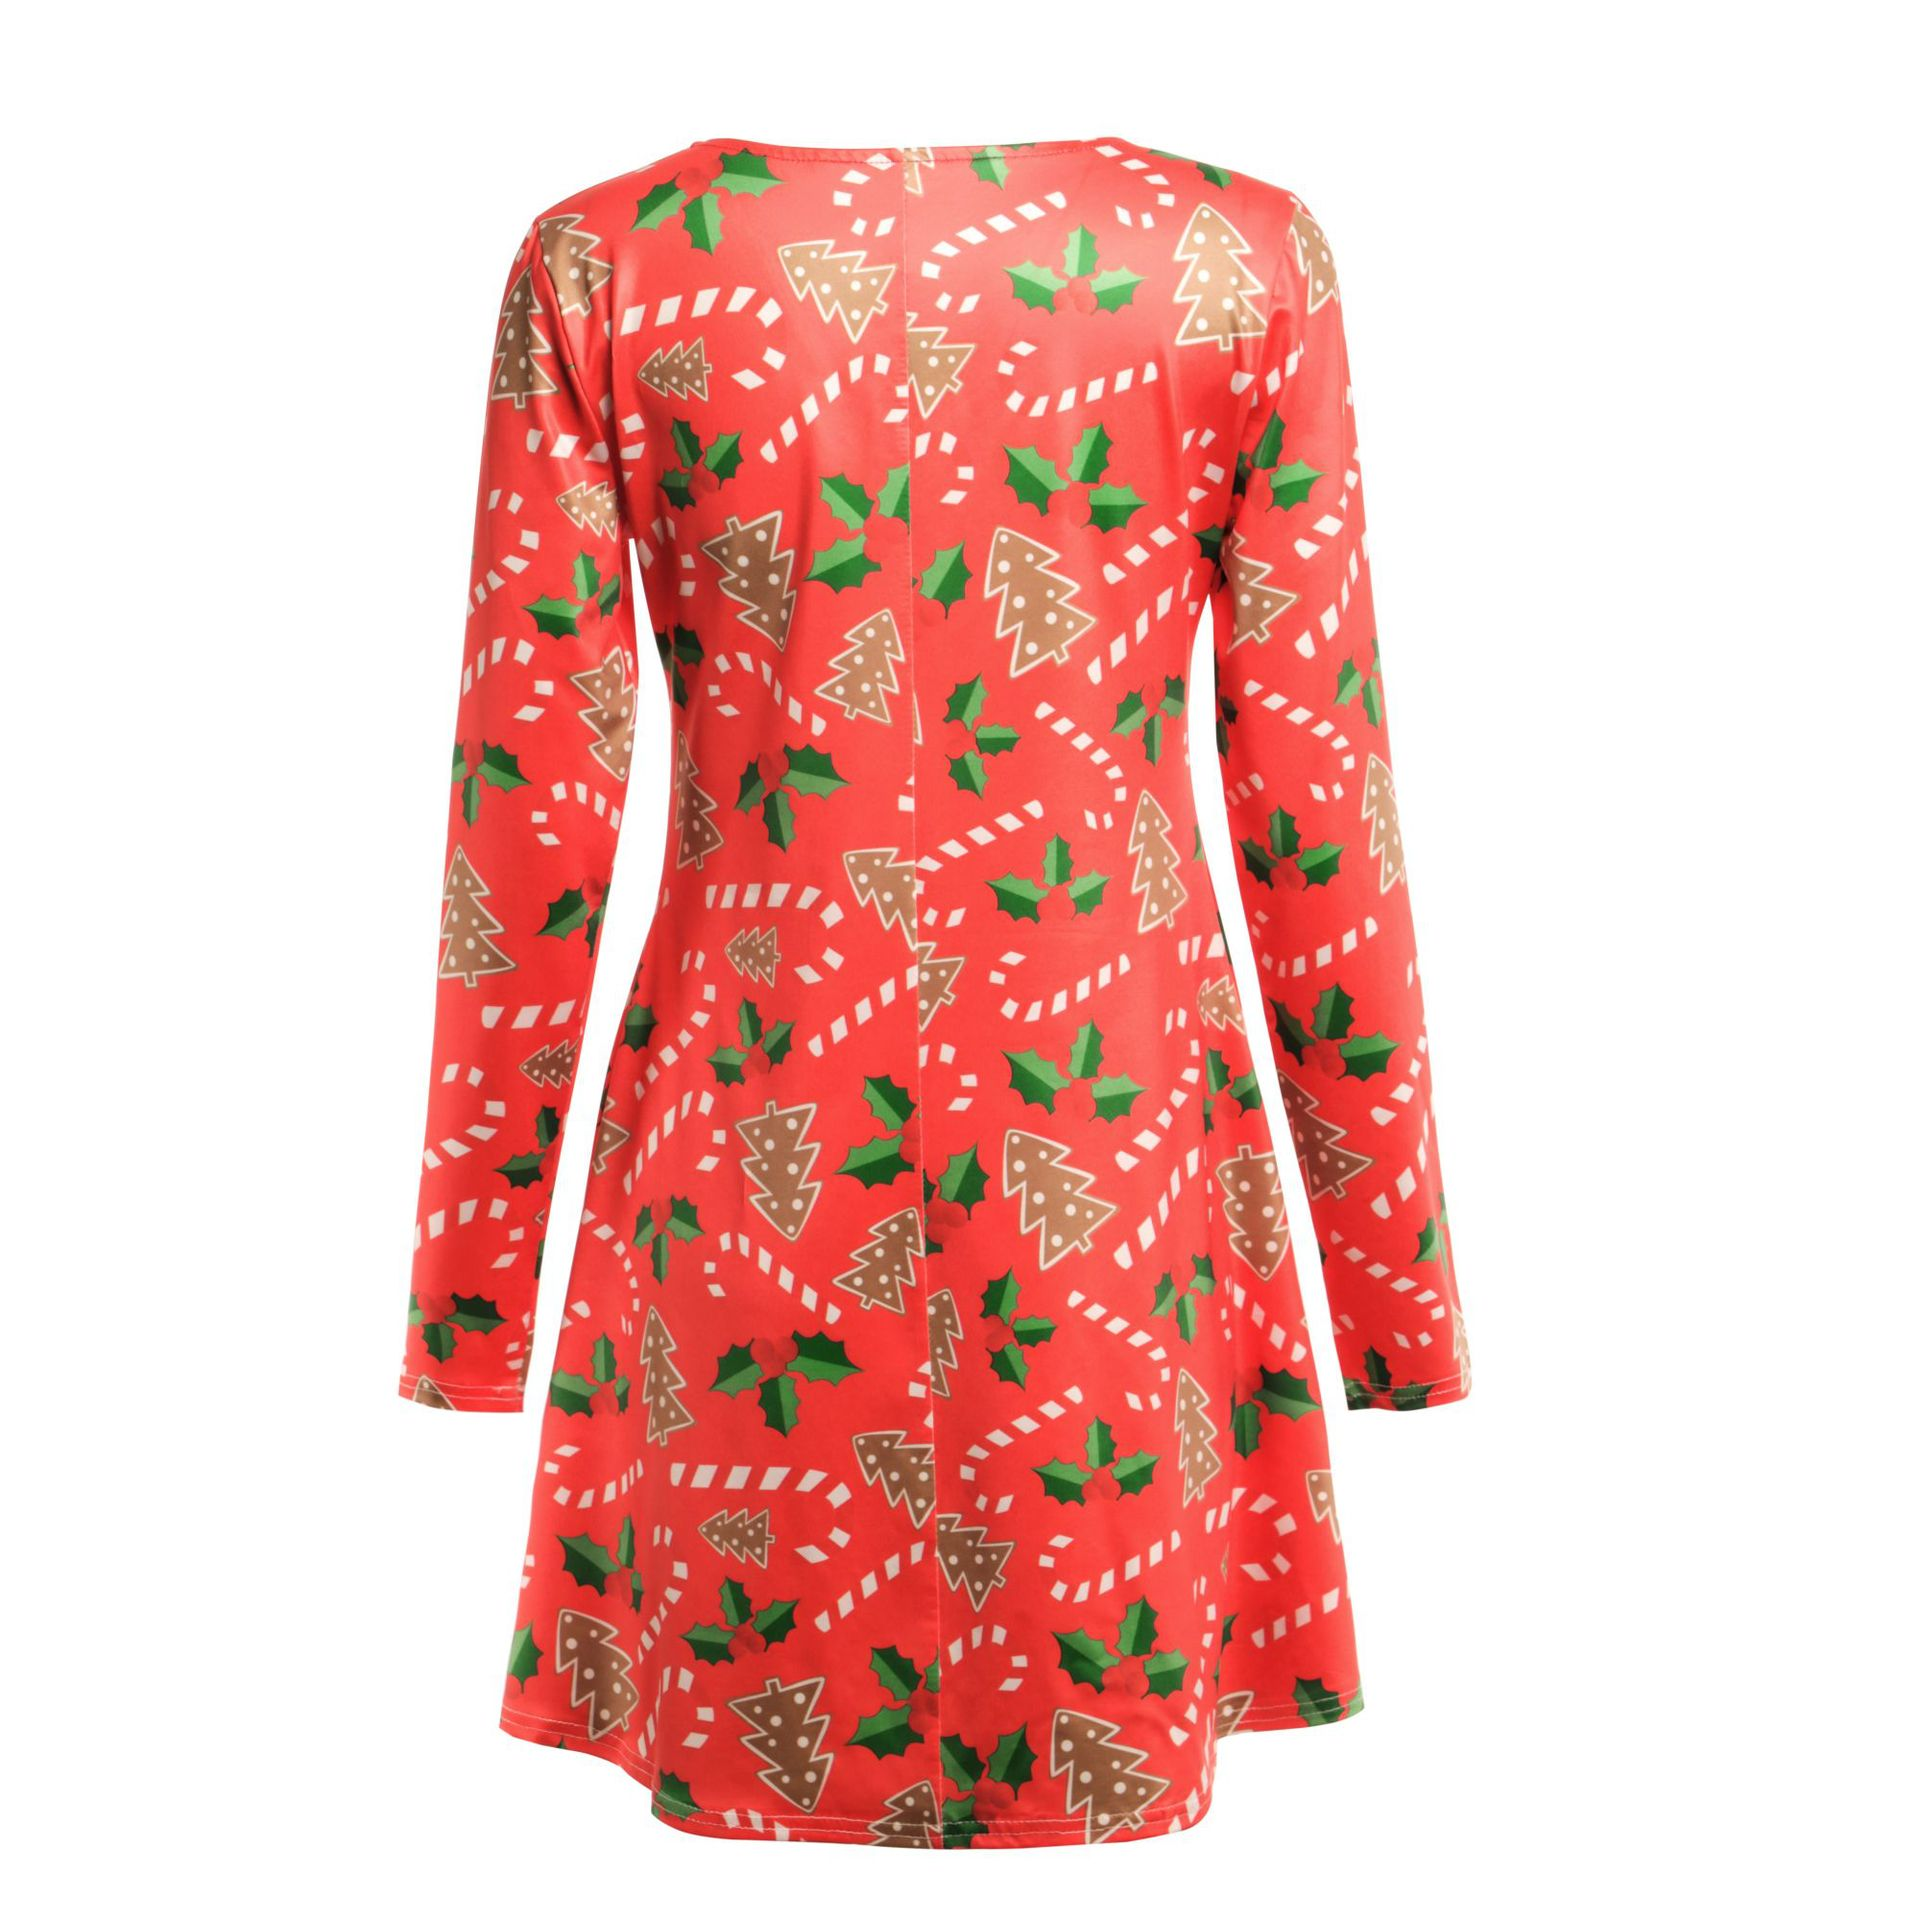 Print Long Sleeve Autumn Winter Christmas Dress Women 19 Casual Loose Short Party Dress Plus Size S-5XL Vestidos 12